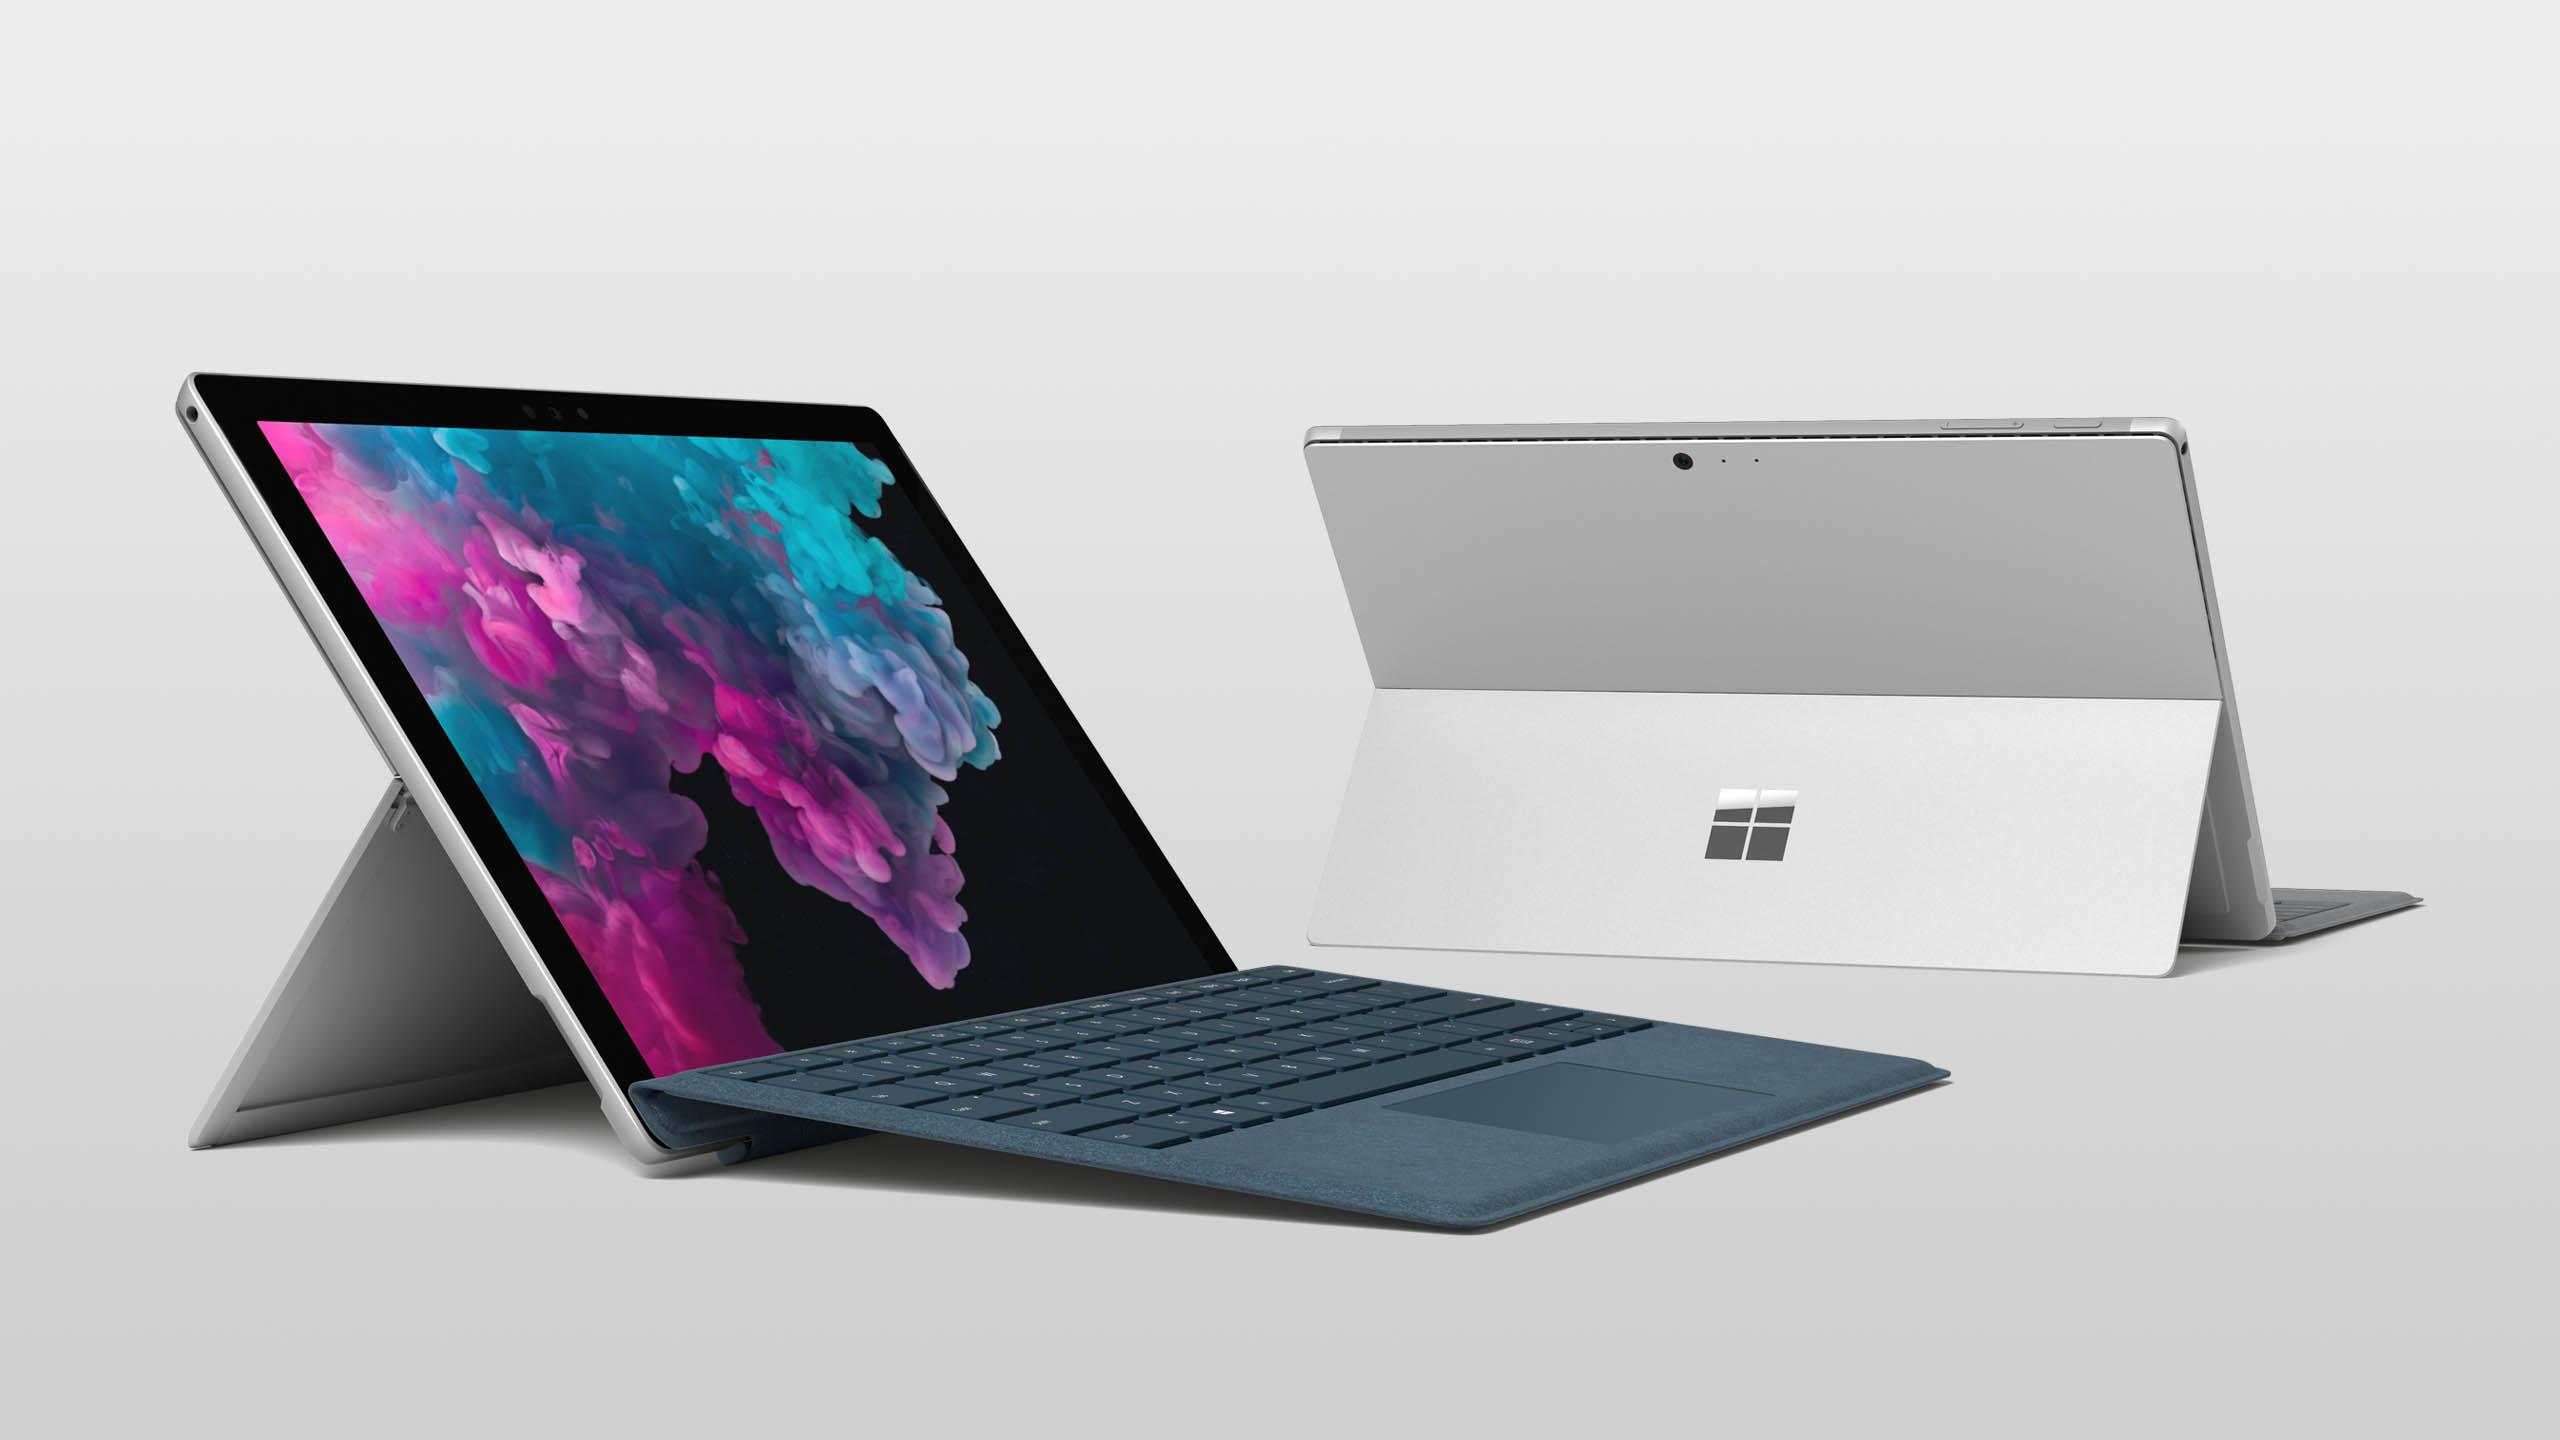 Surface Pro 6 platingrau